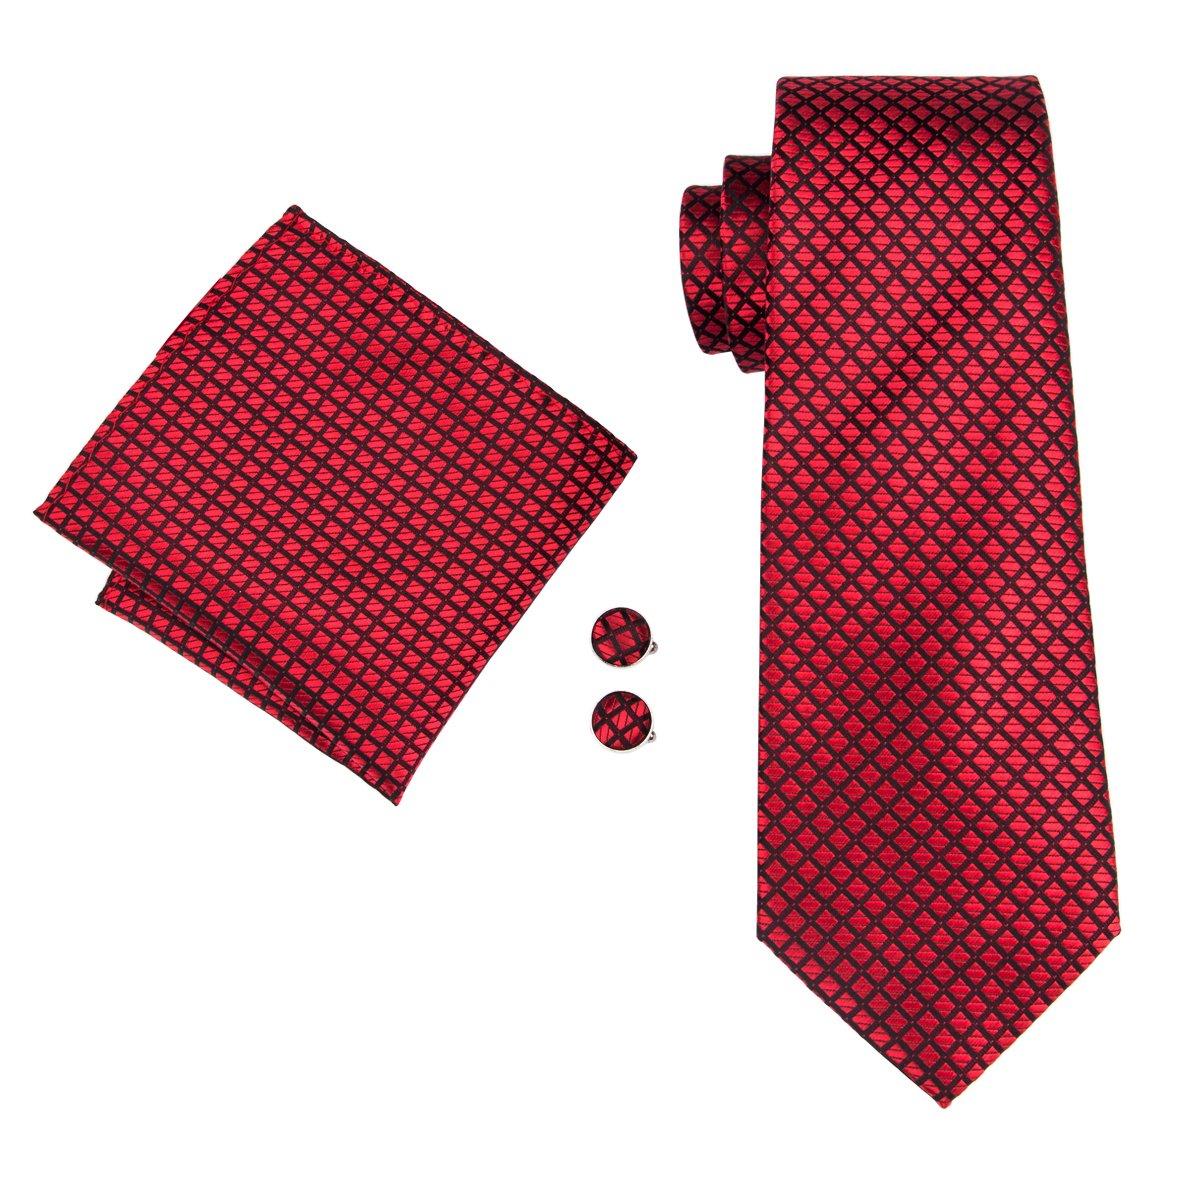 Hi-Tie New Arrive Fashion Woven Silk Necktie Tie Hanky Cufflinks set N-1618